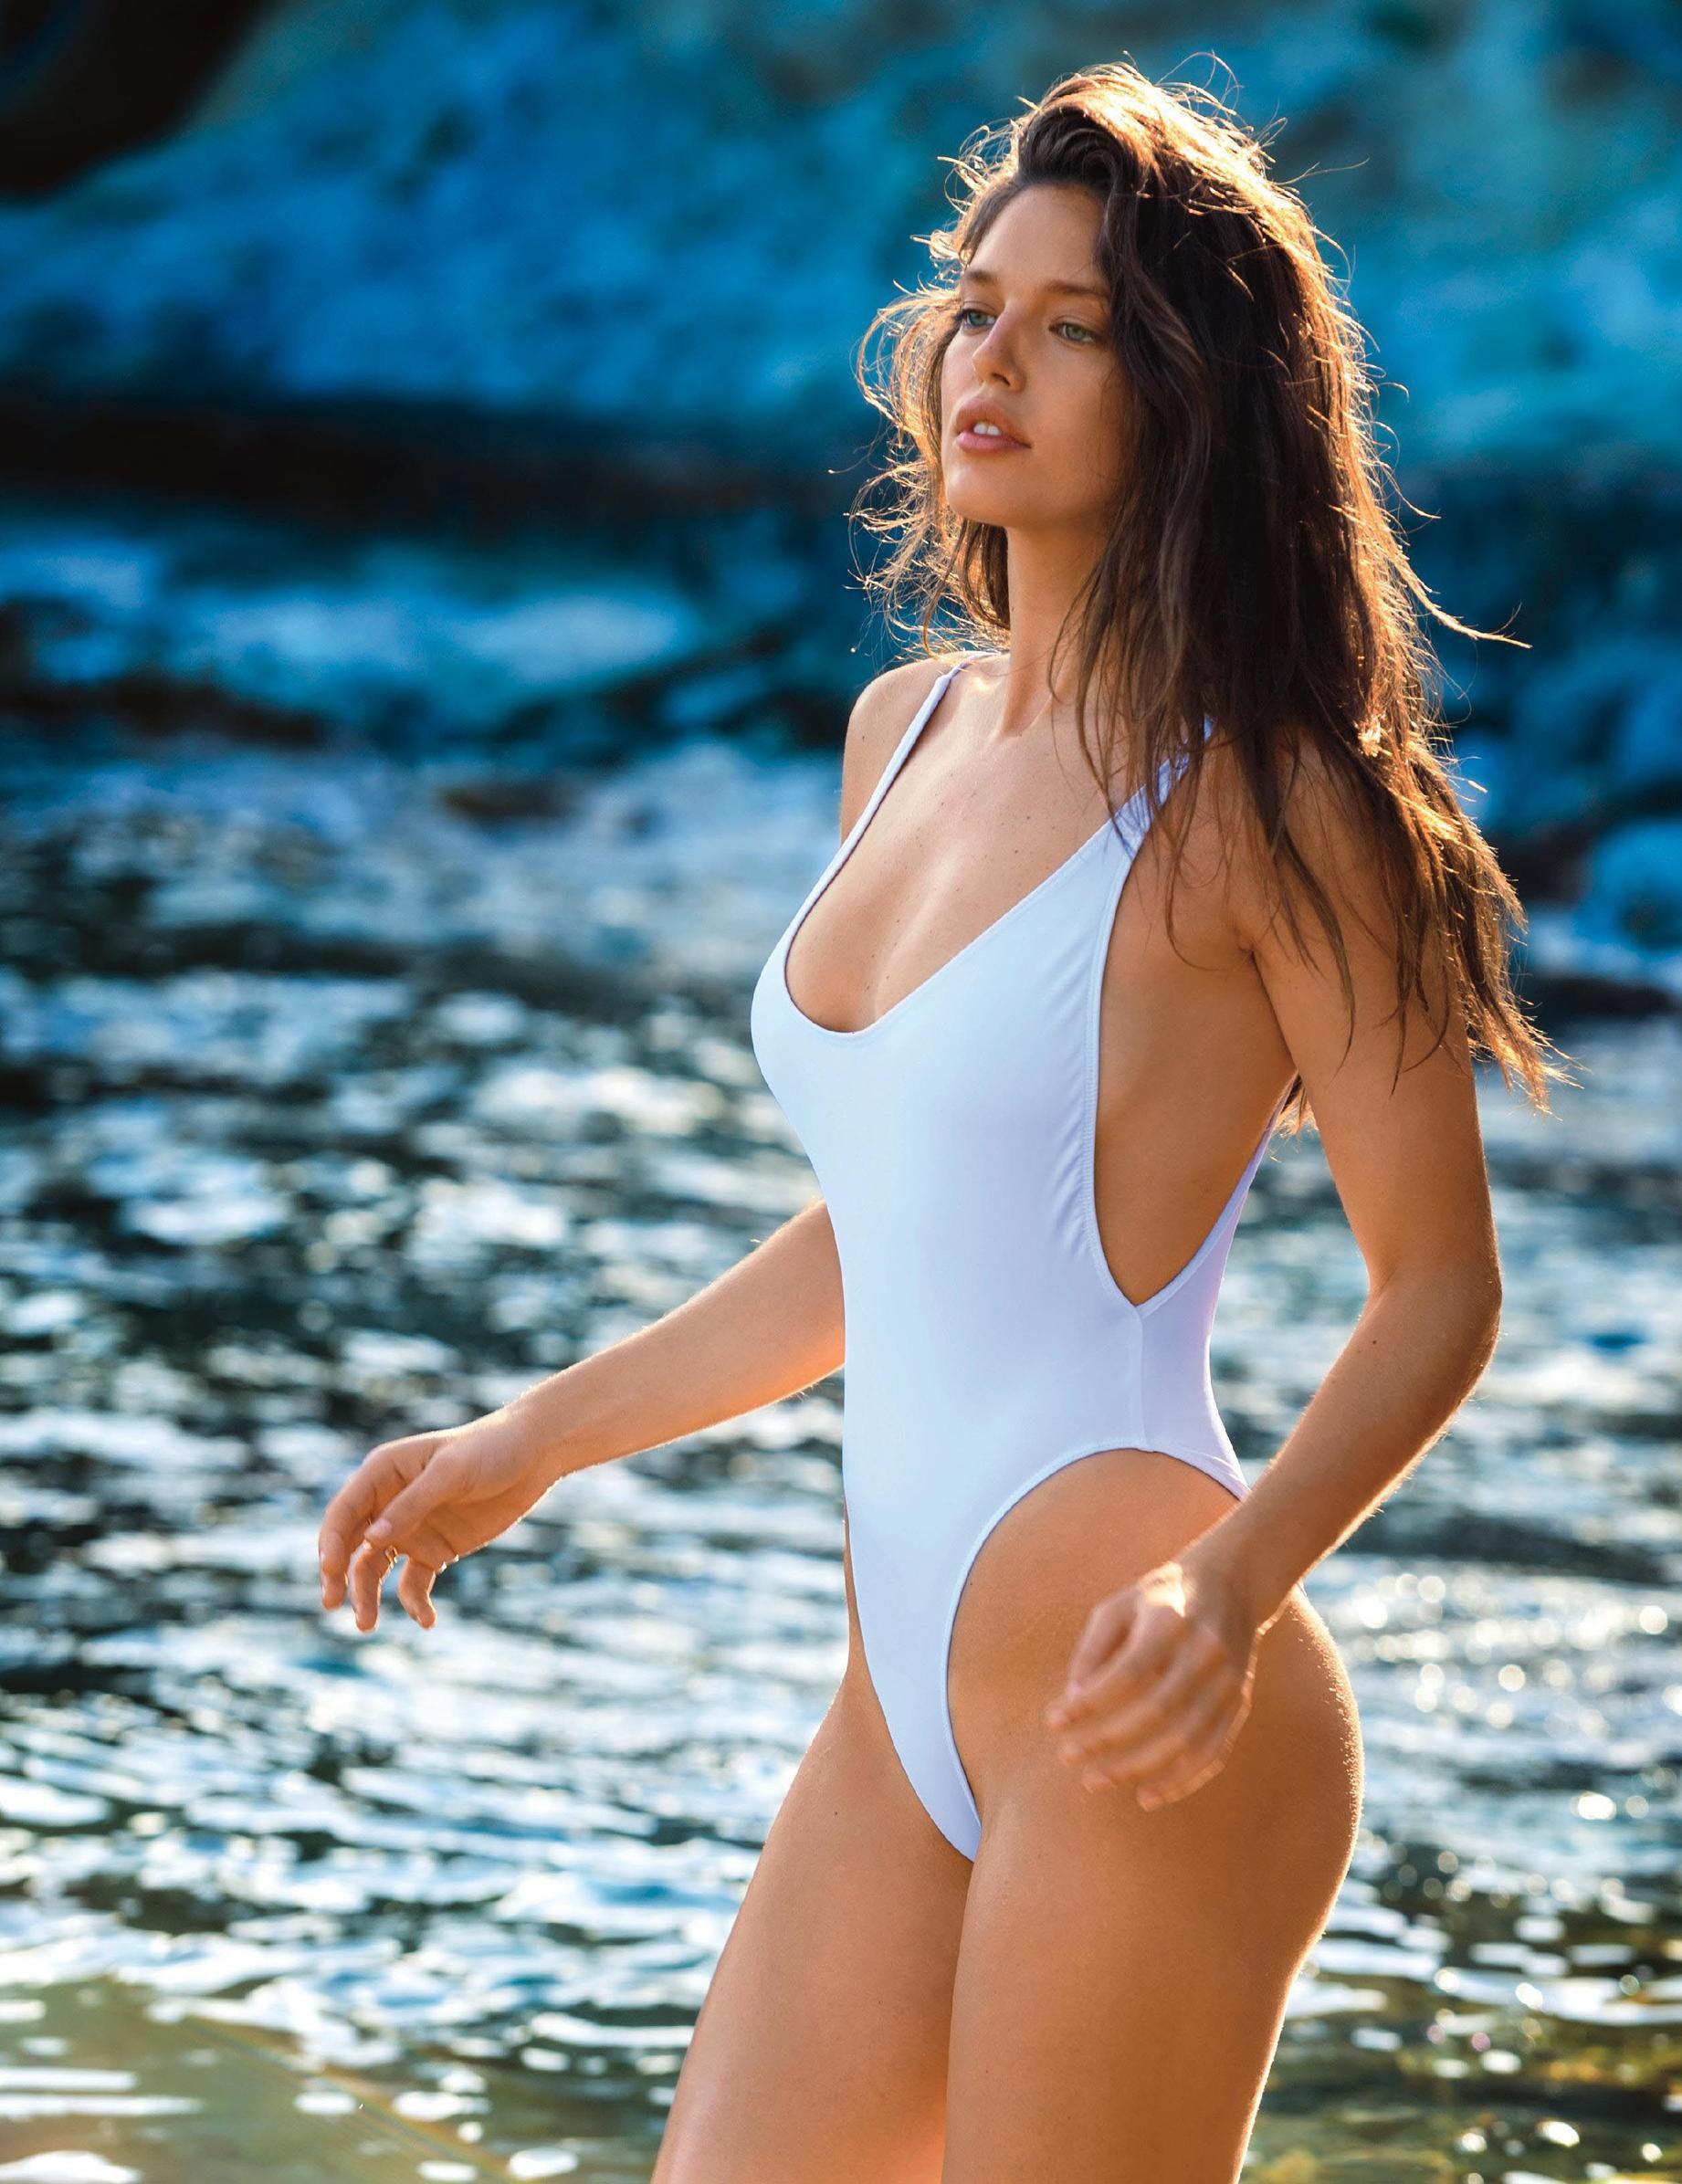 Bikini Emily Isabella nudes (47 foto and video), Sexy, Bikini, Twitter, see through 2017